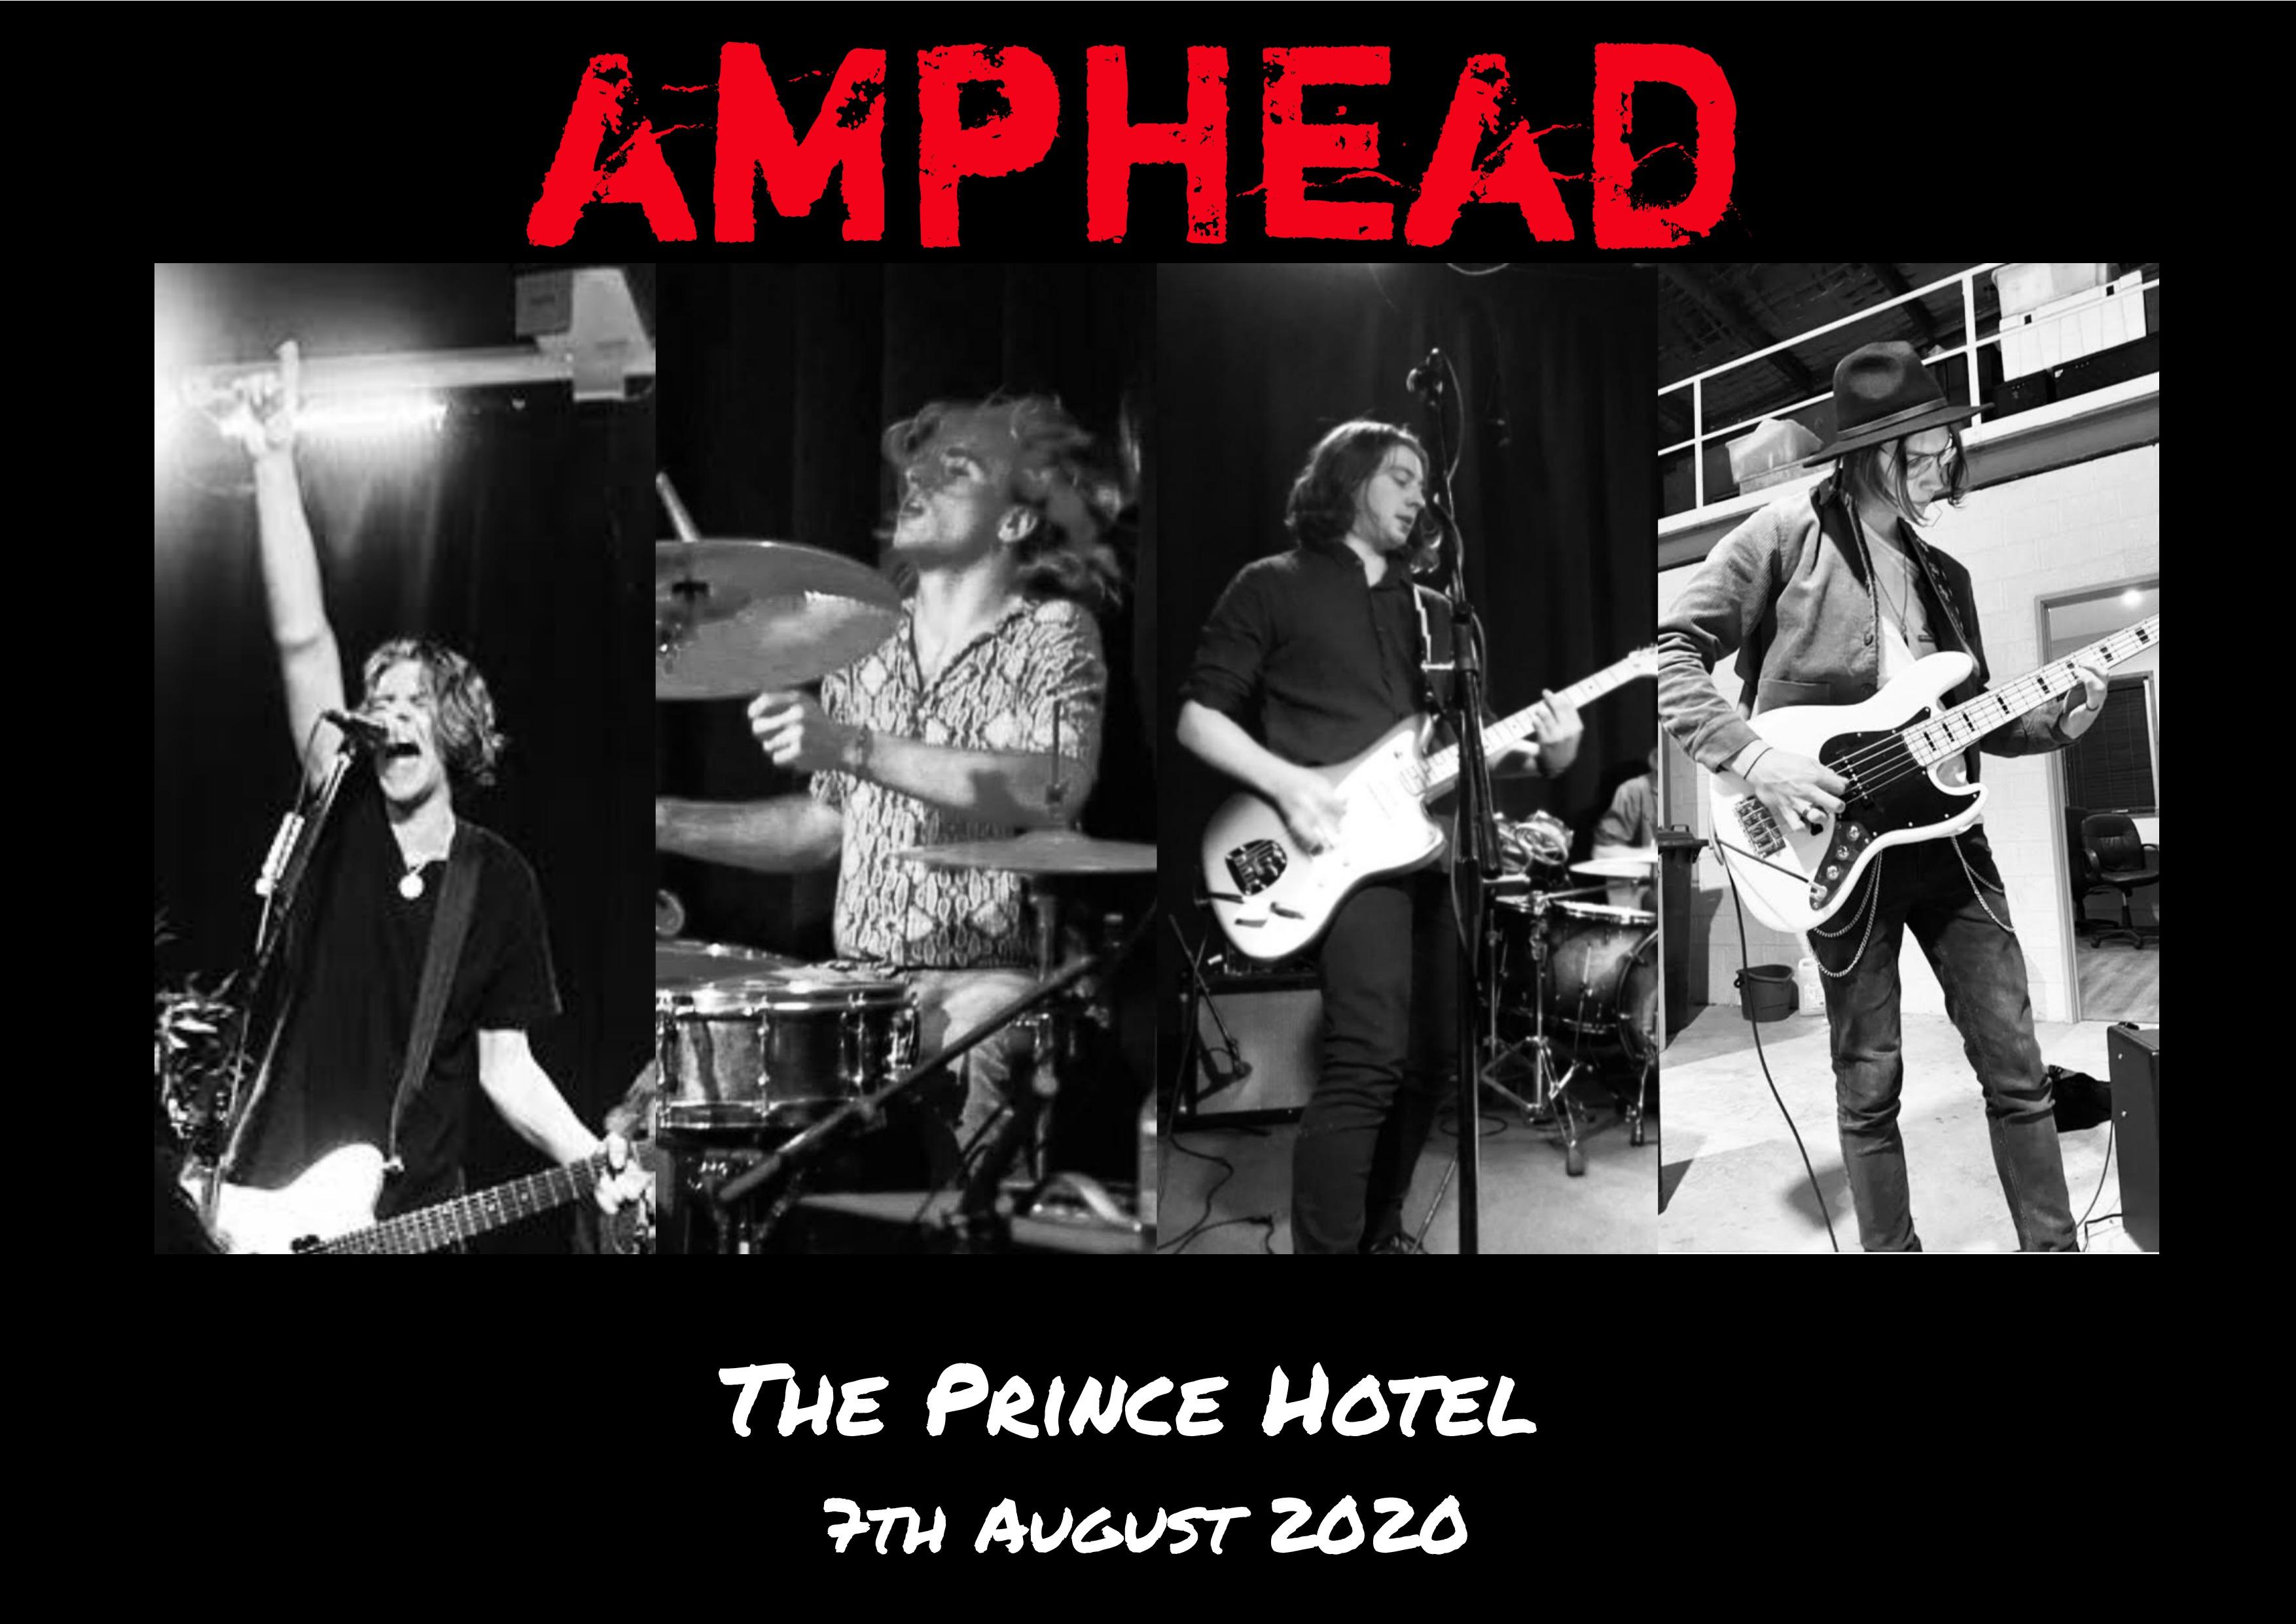 The Prince Hotel Amphead Promo Picture A4